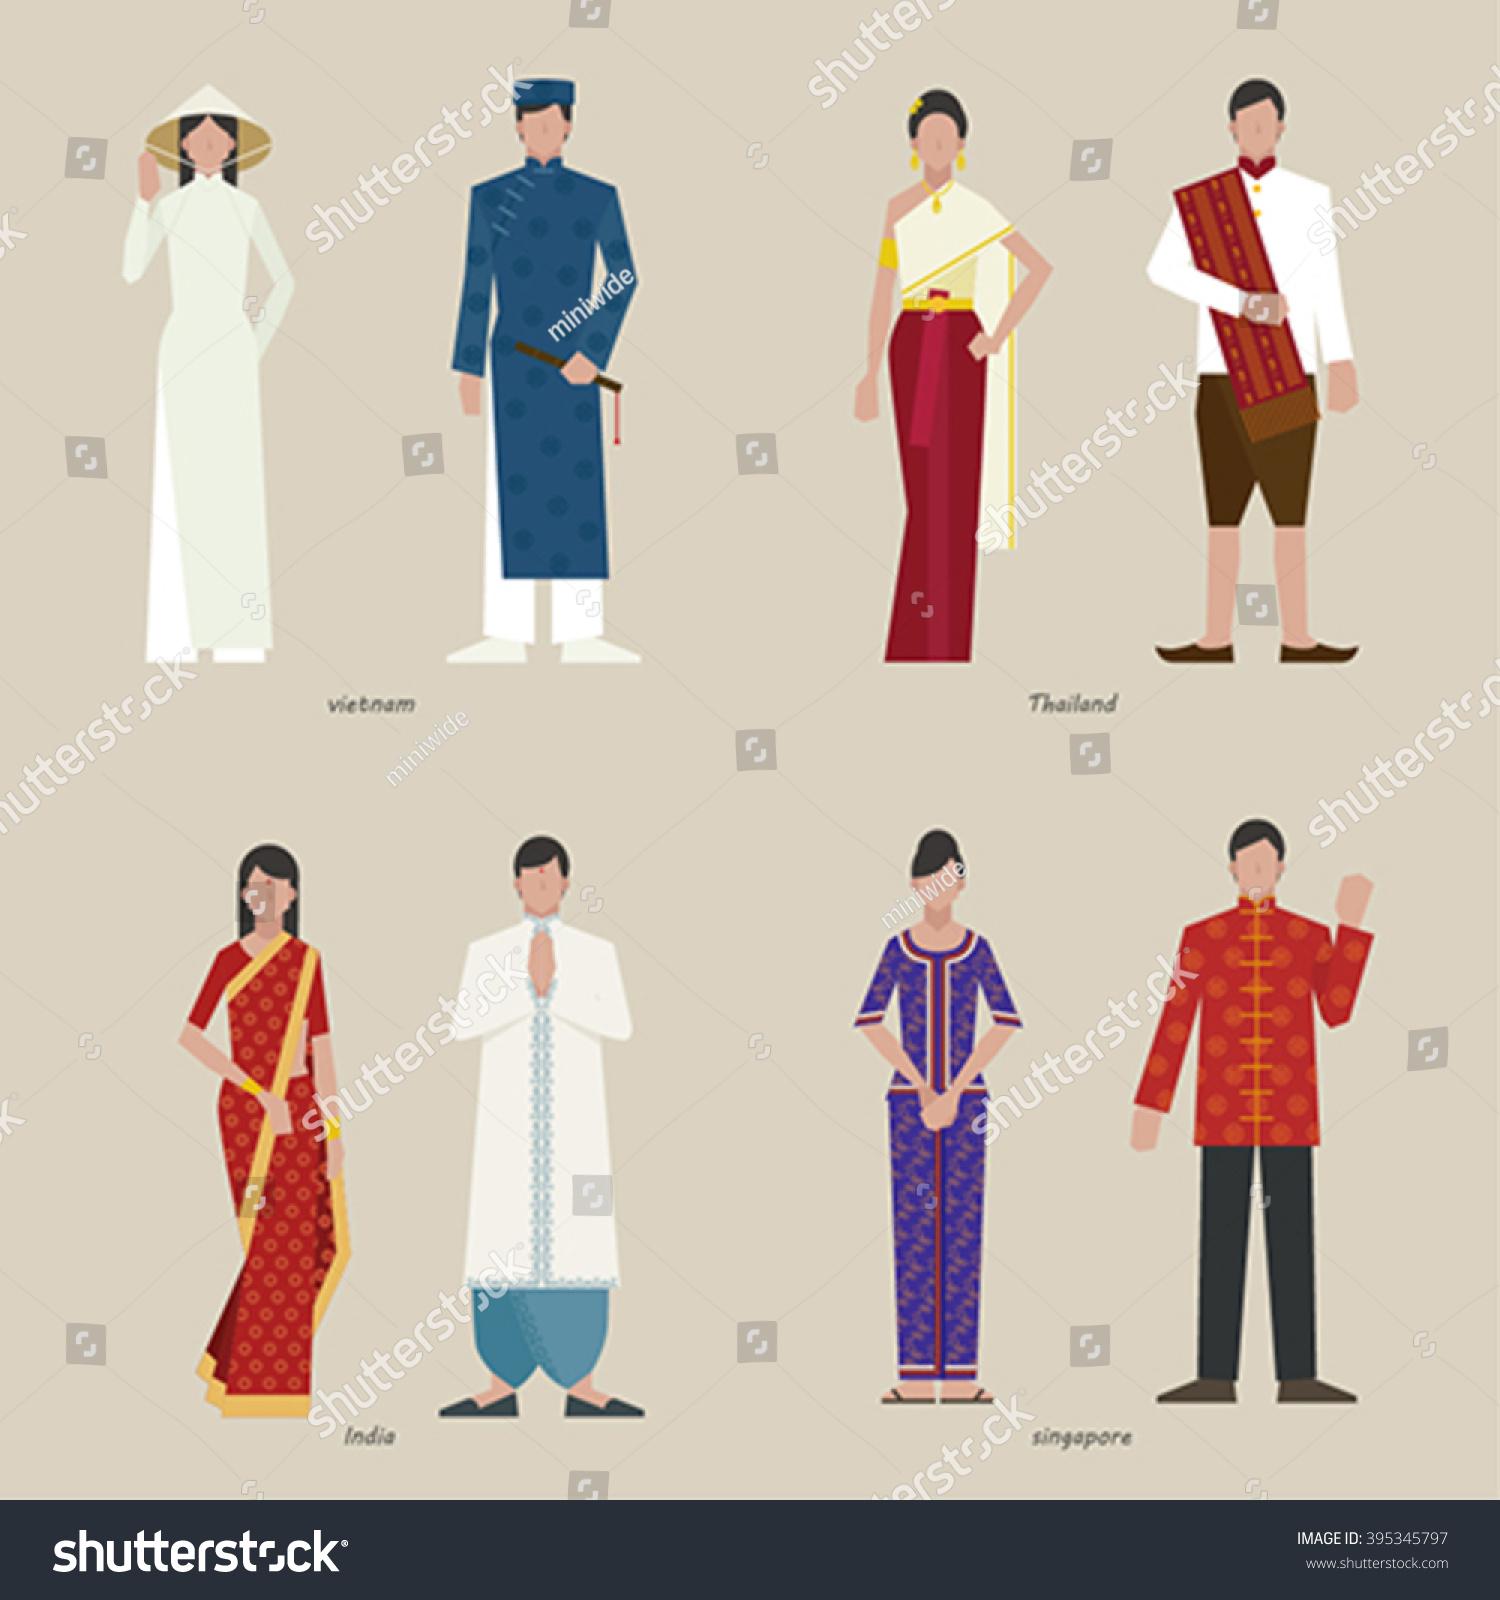 Character Design Job Singapore : Traditional clothing vietnam india singapore thailand